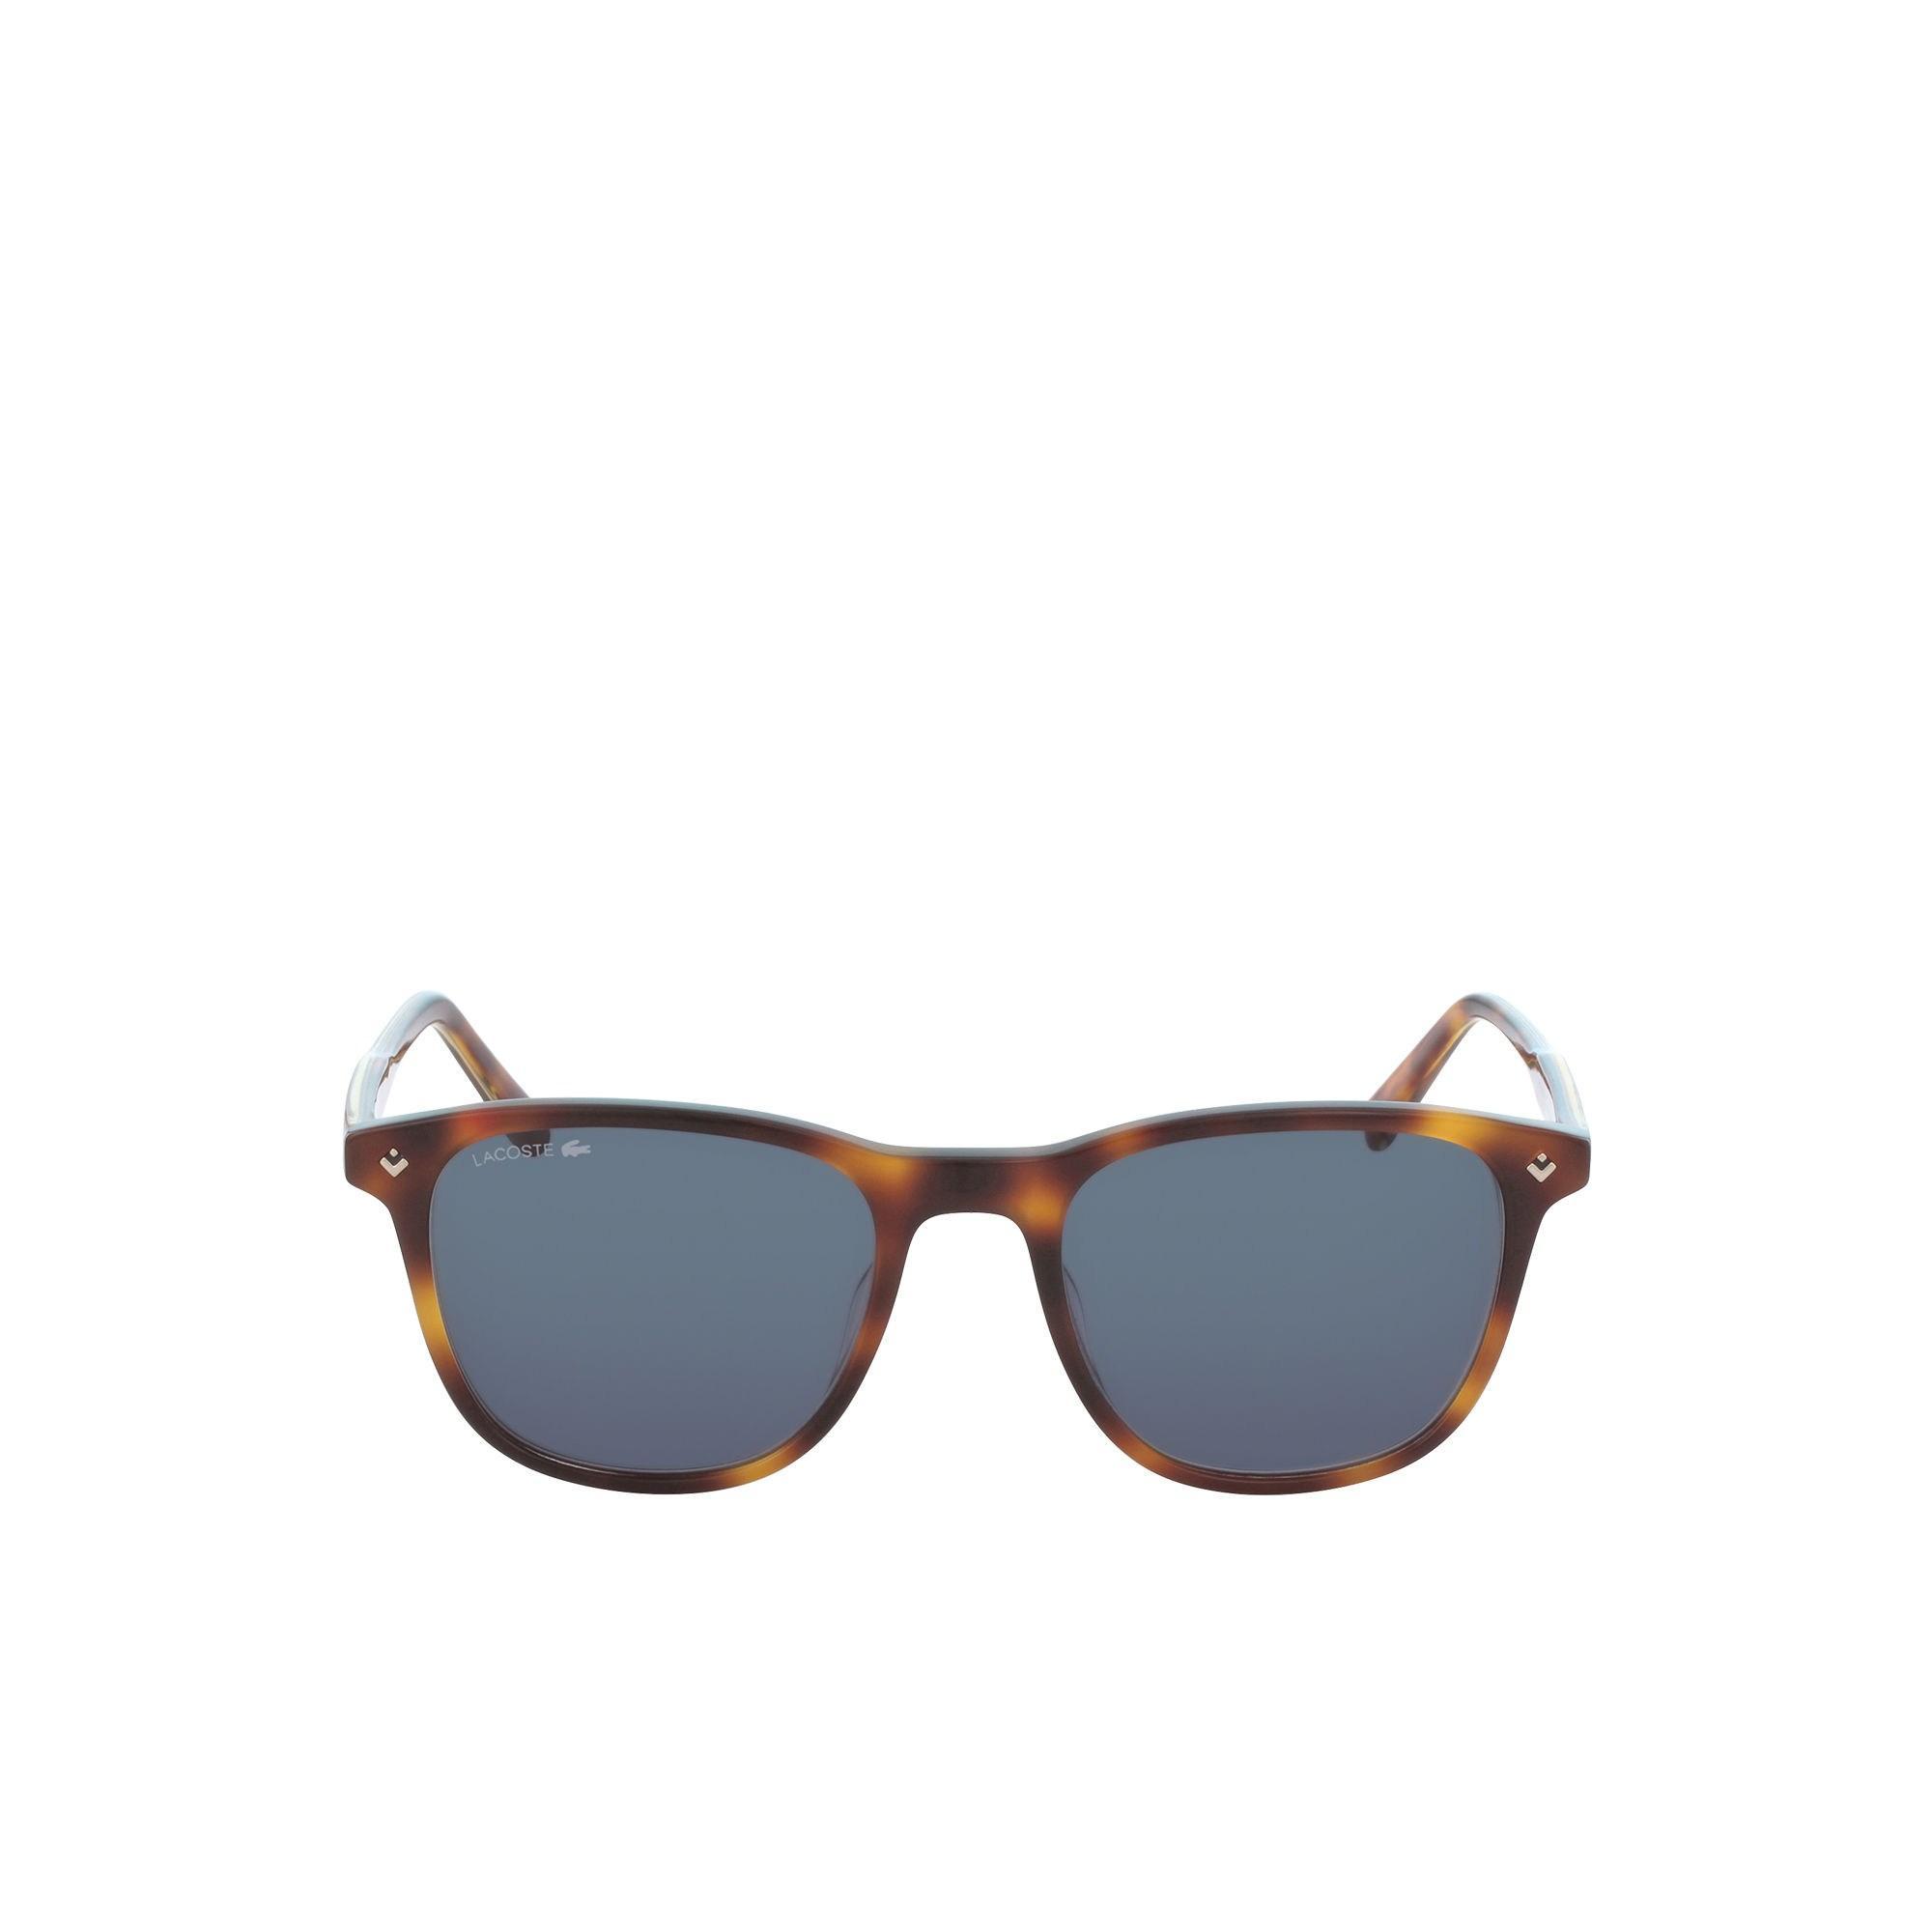 3c81e738687f Lacoste - Blue Plastic Petit Piqué Sunglasses - Lyst. View fullscreen